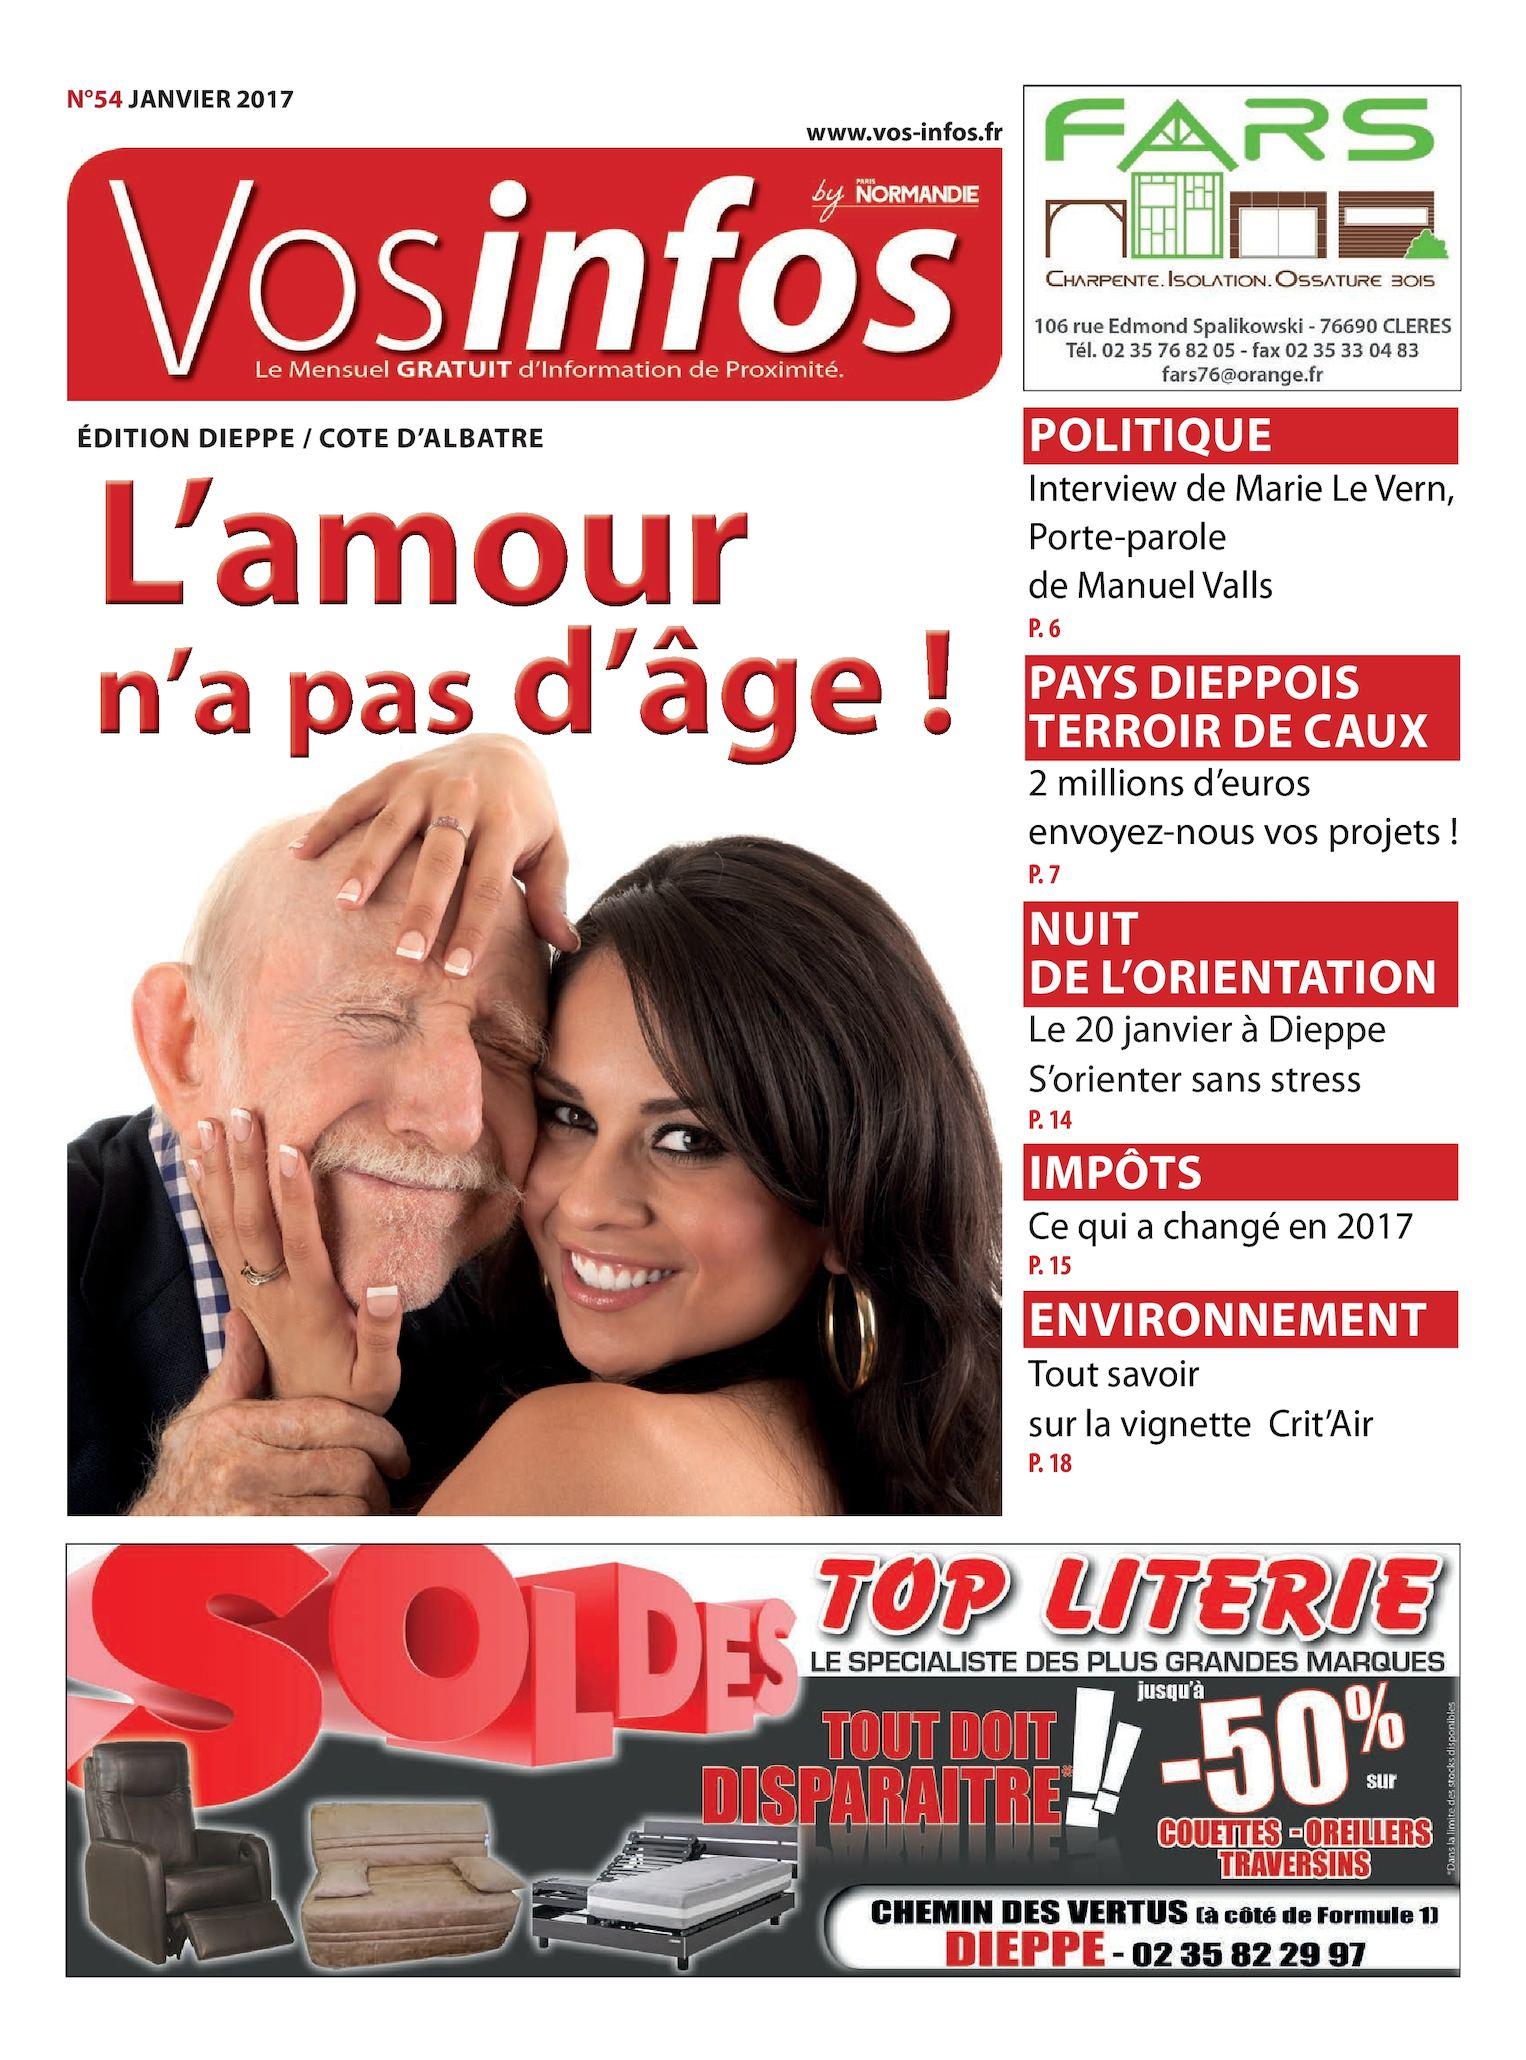 Calaméo - Vosinfos Dieppe Janv 2017 4f9ccc08330